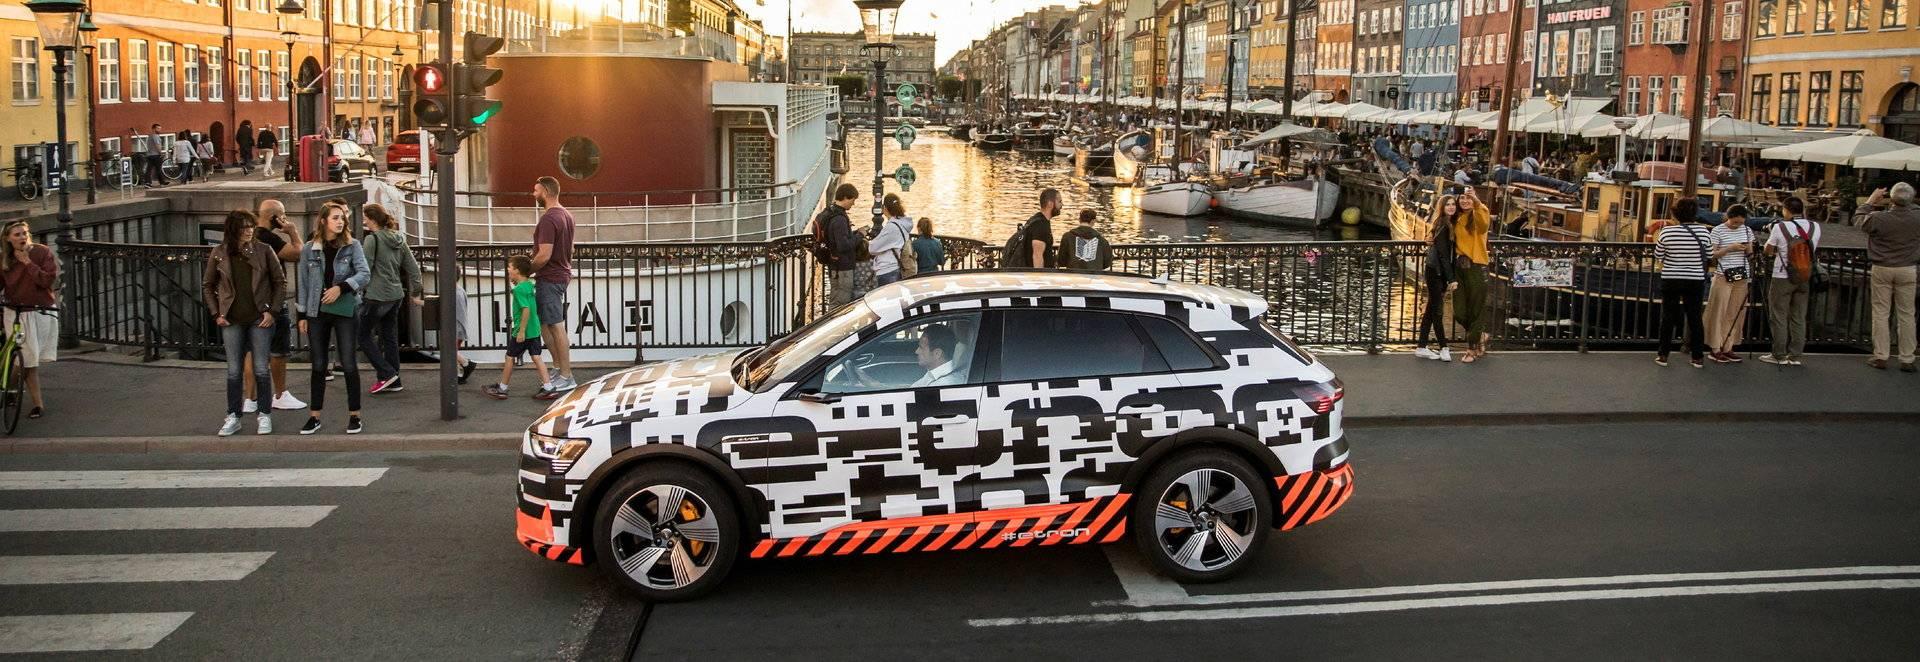 Audi desvela el interior del e-tron prototype